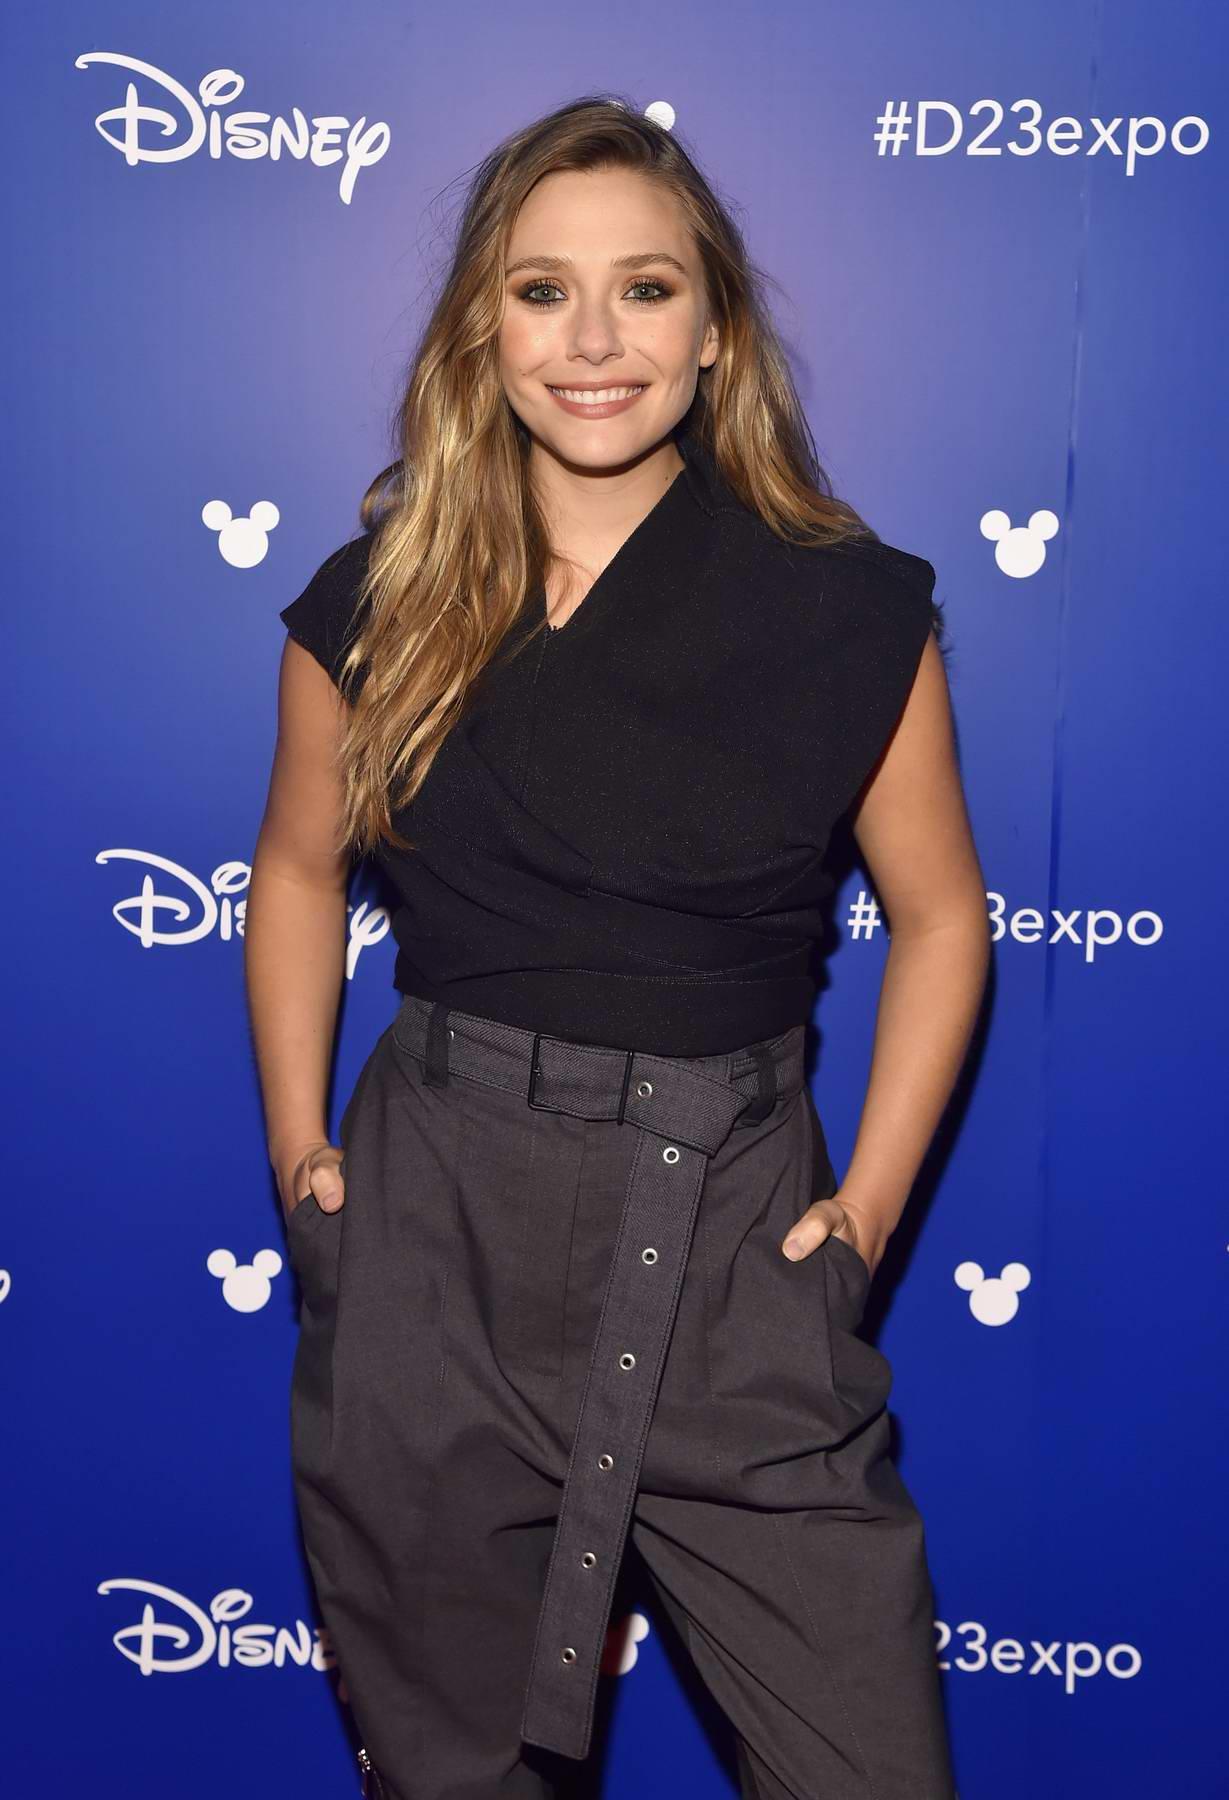 Elizabeth Olsen at Avengers: Infinity War Presentation at Disney's D23 EXPO 2017 in Anaheim, California